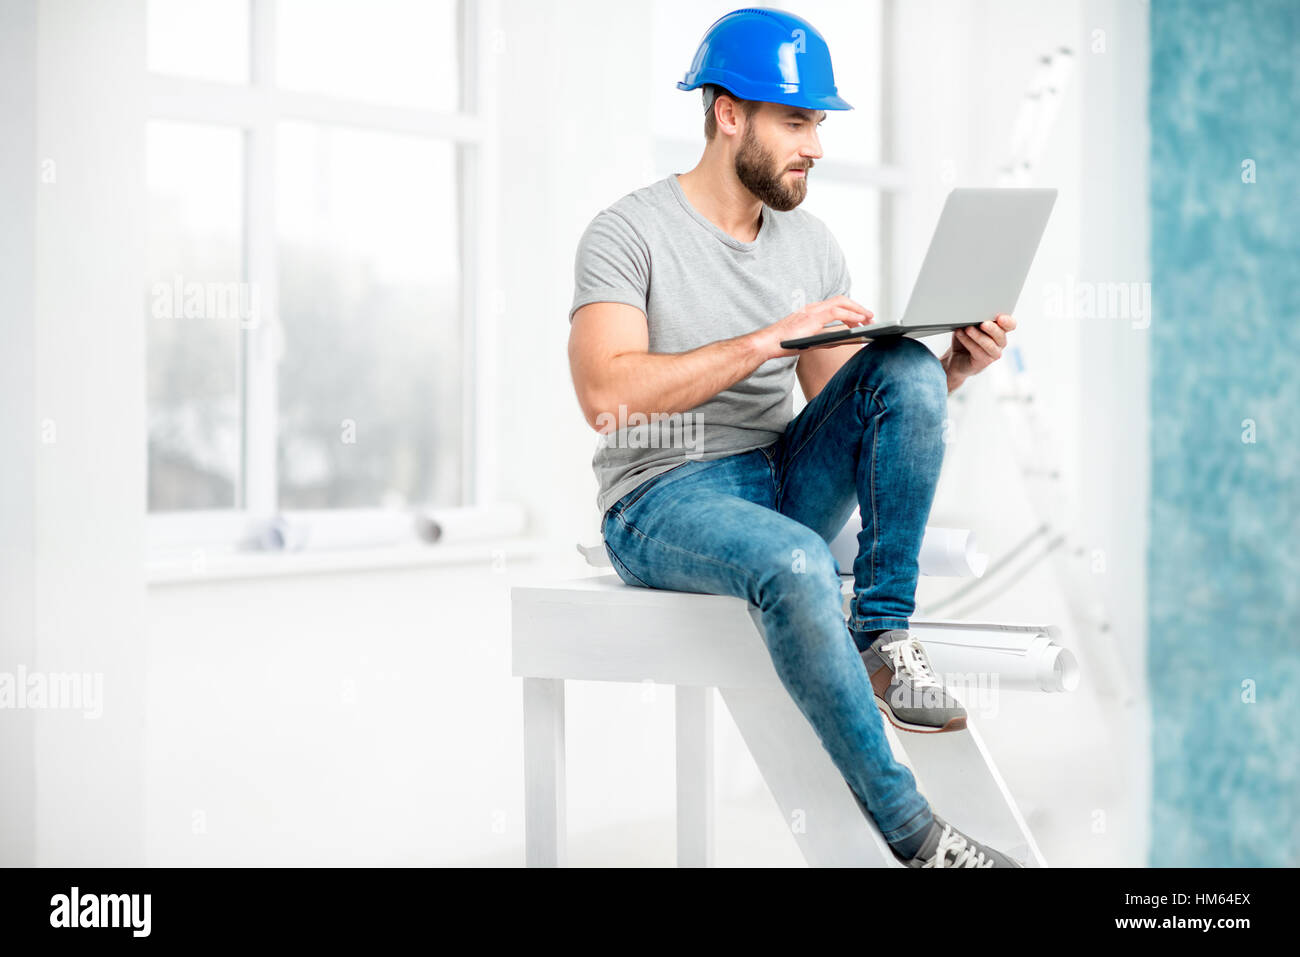 Builder or repairman portrait Stock Photo